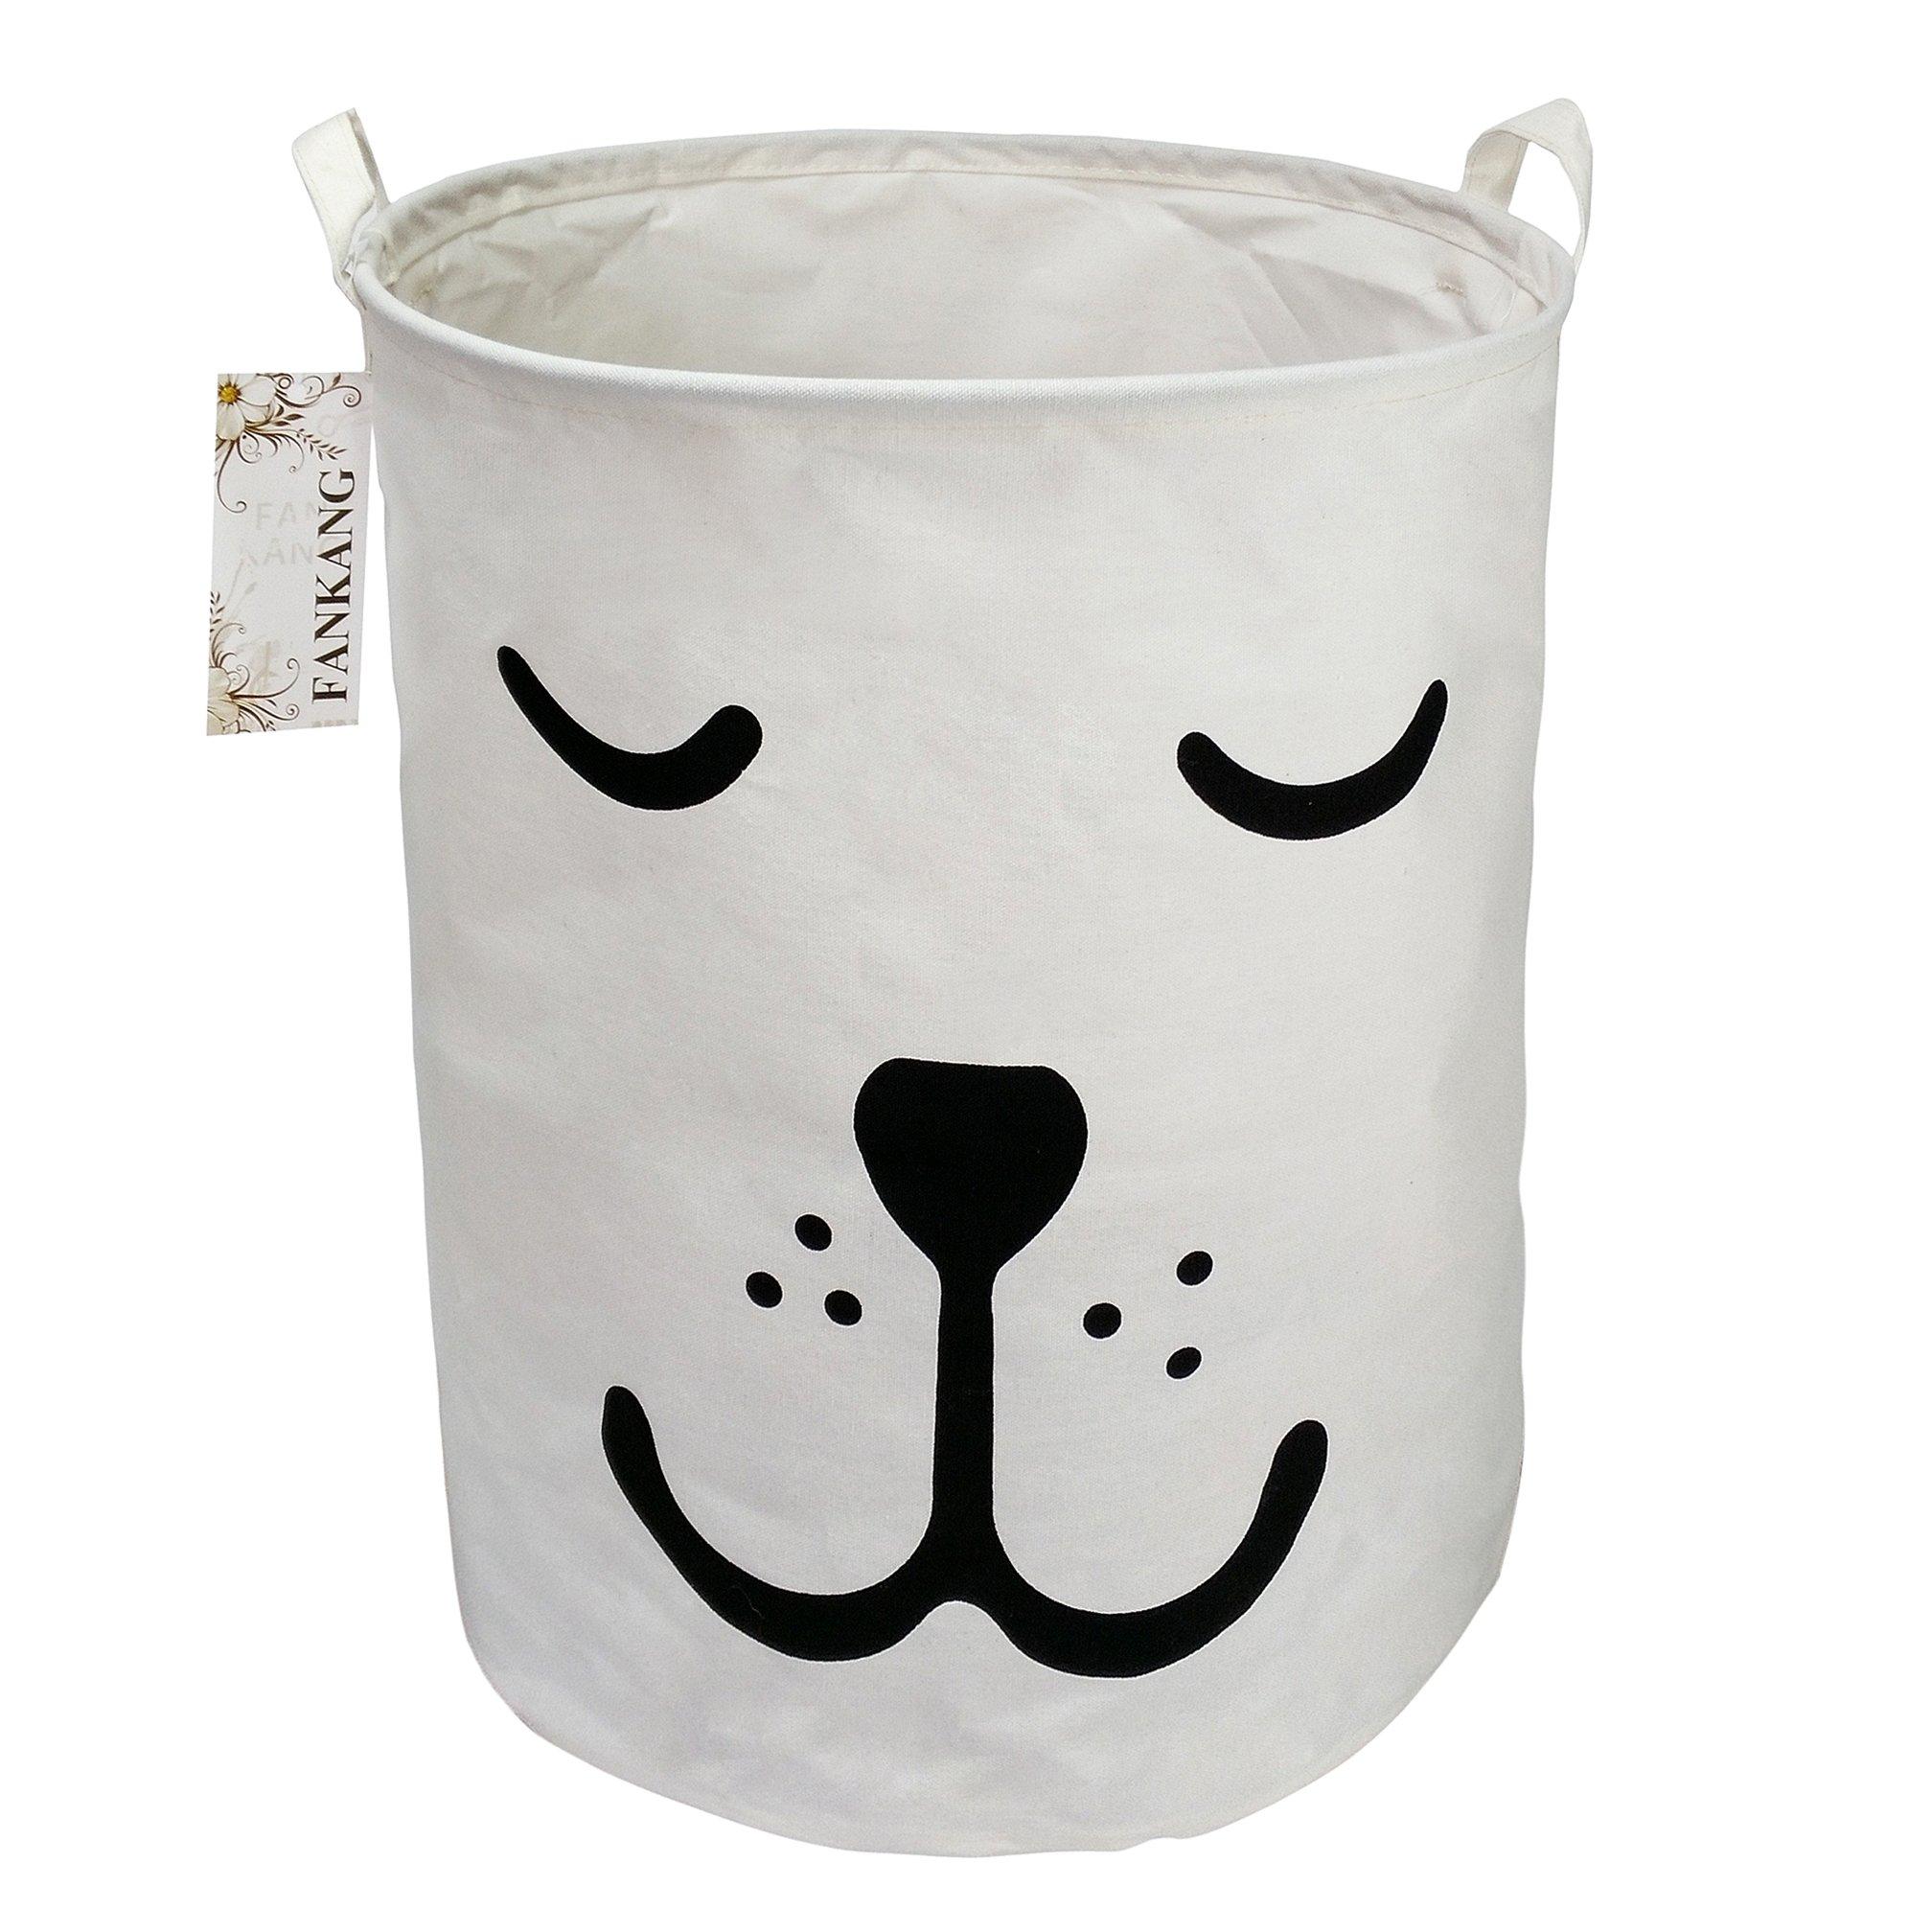 FANKANG Large Laundry Hamper Bucket Waterproof Coating Storage Bin Collapsible Washing Basket Home Nursery Toy Organizer (Dog)